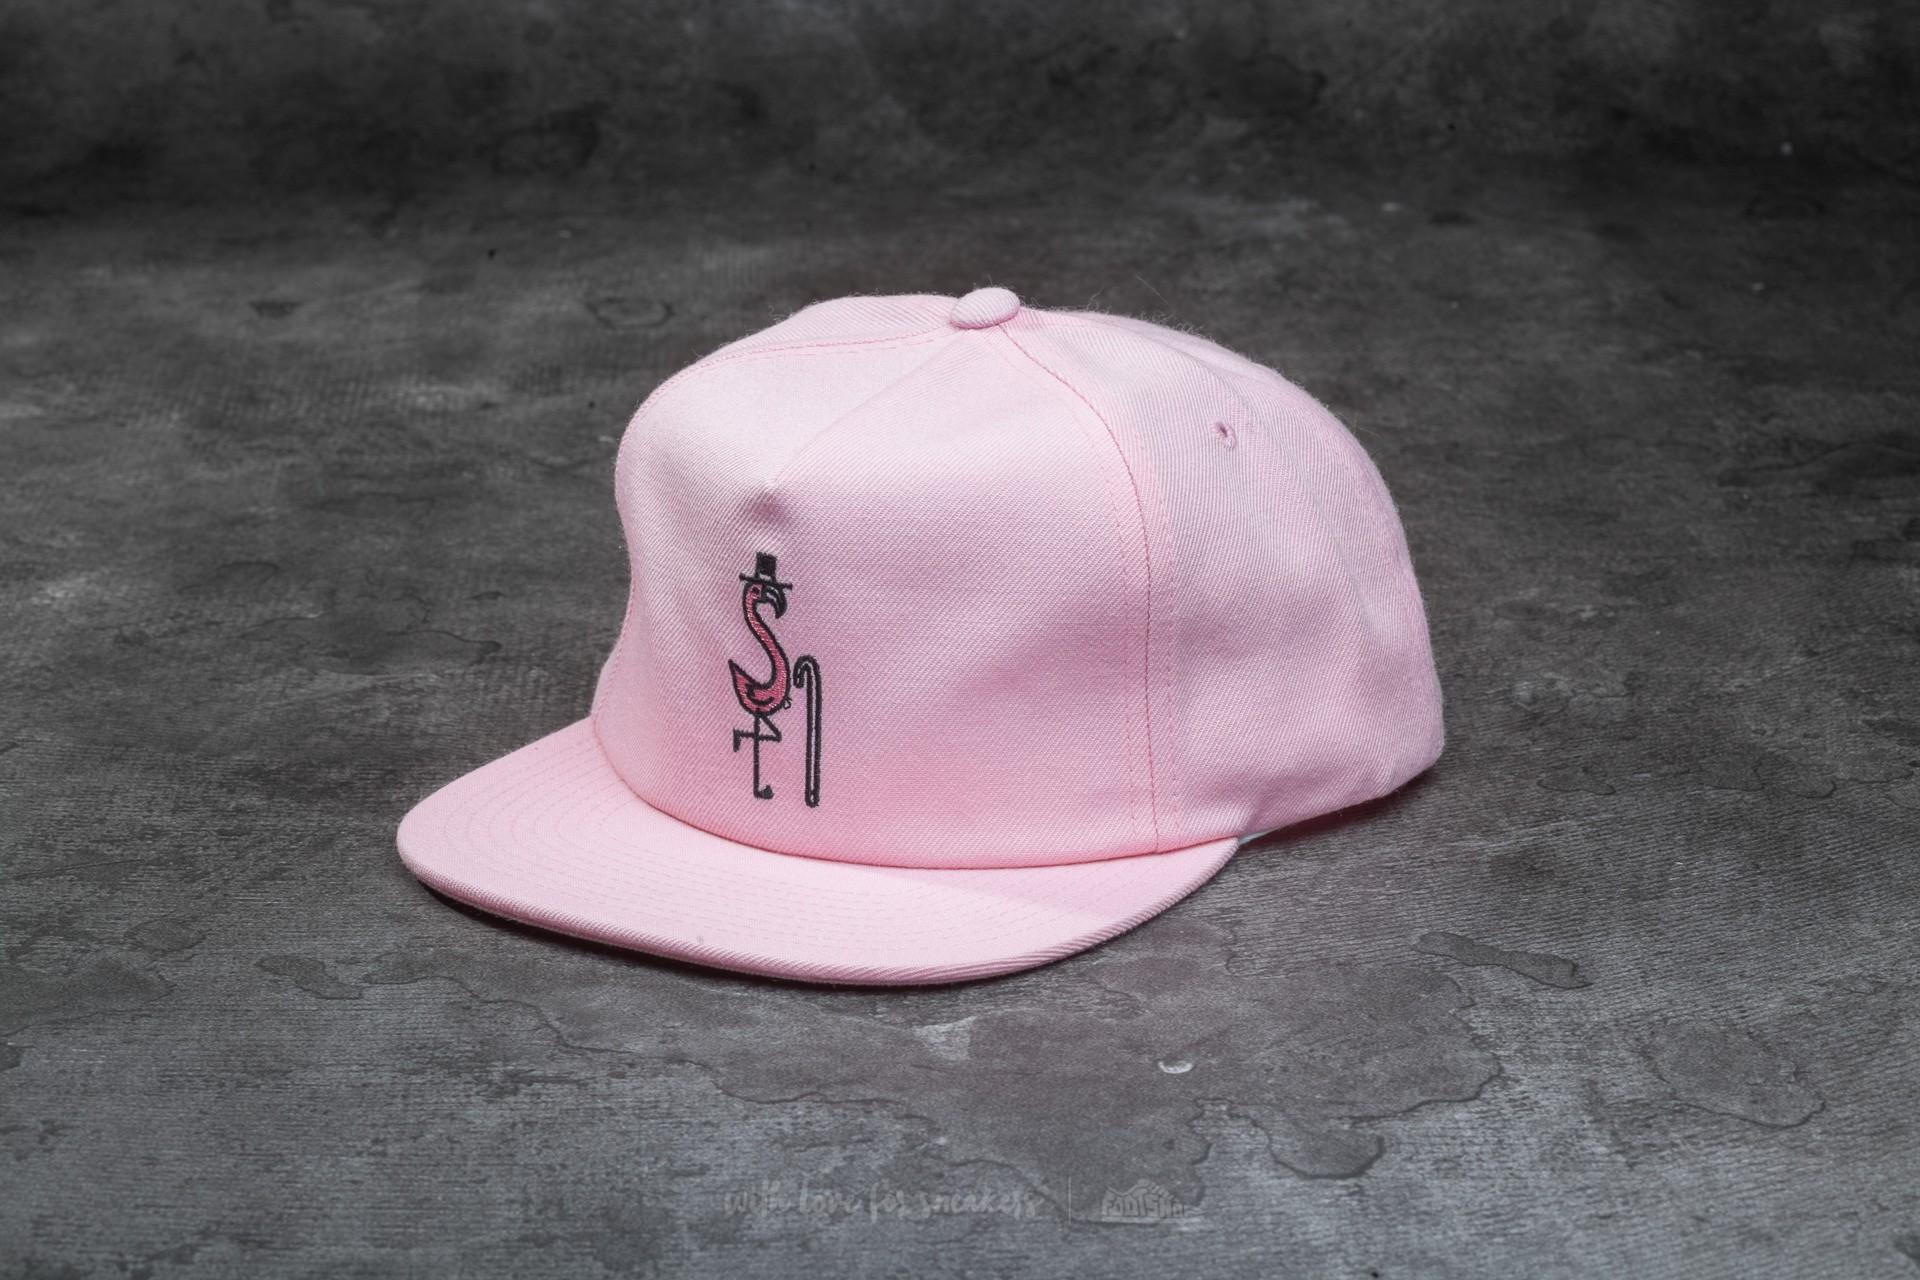 ae5a190d8de Stüssy Flamingo Cap Light Pink